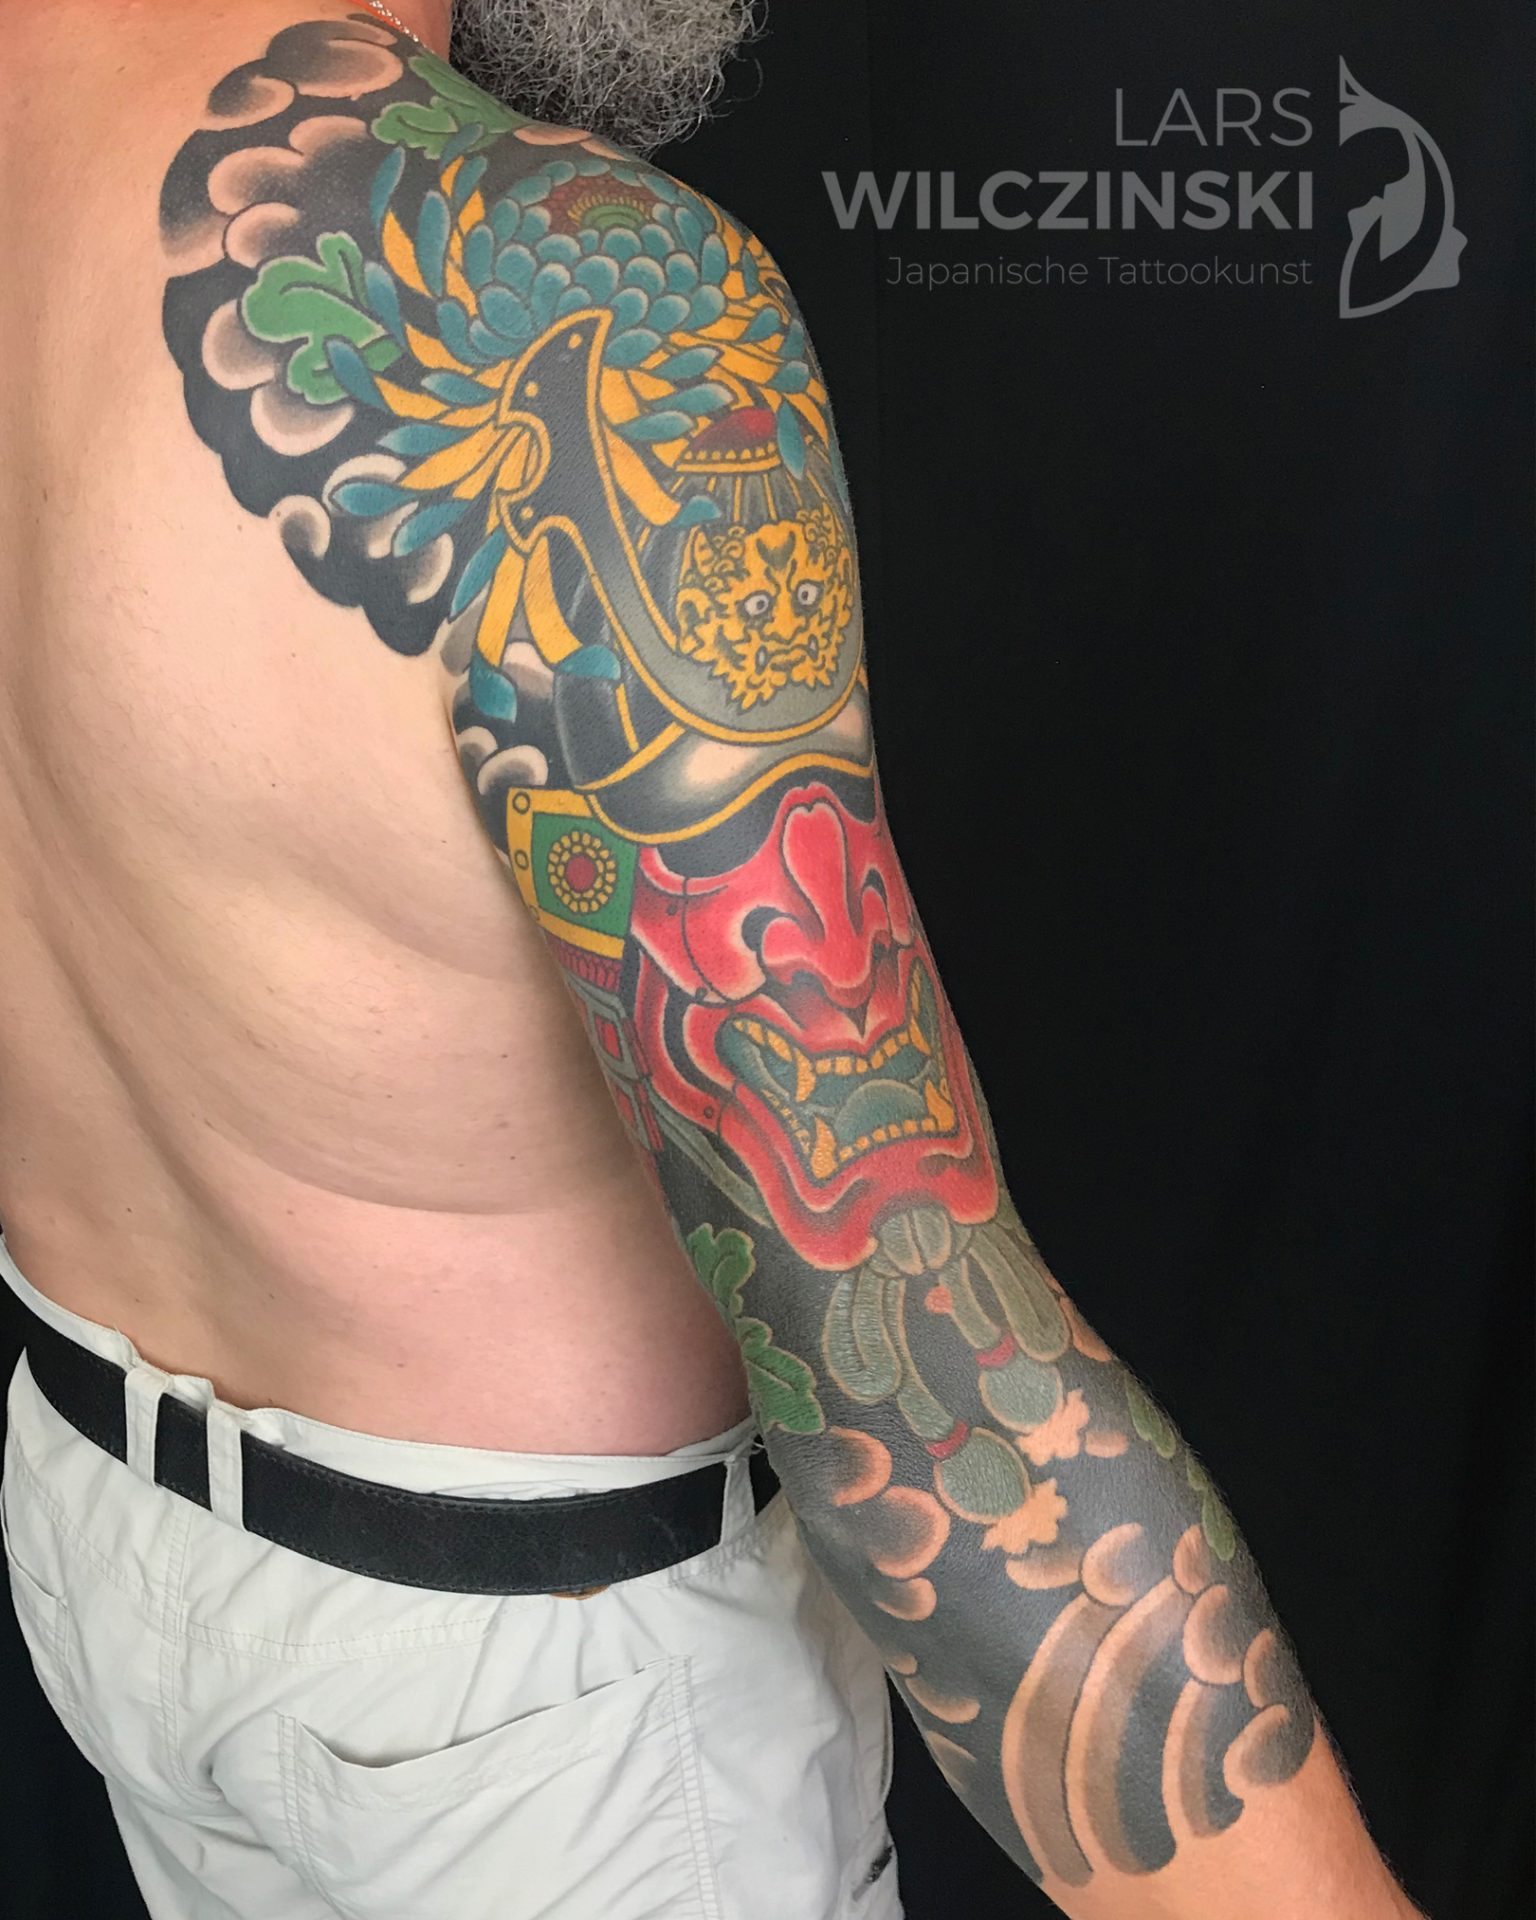 Tattoo Kabuto und Chrysanthemen 3/4 Sleeve